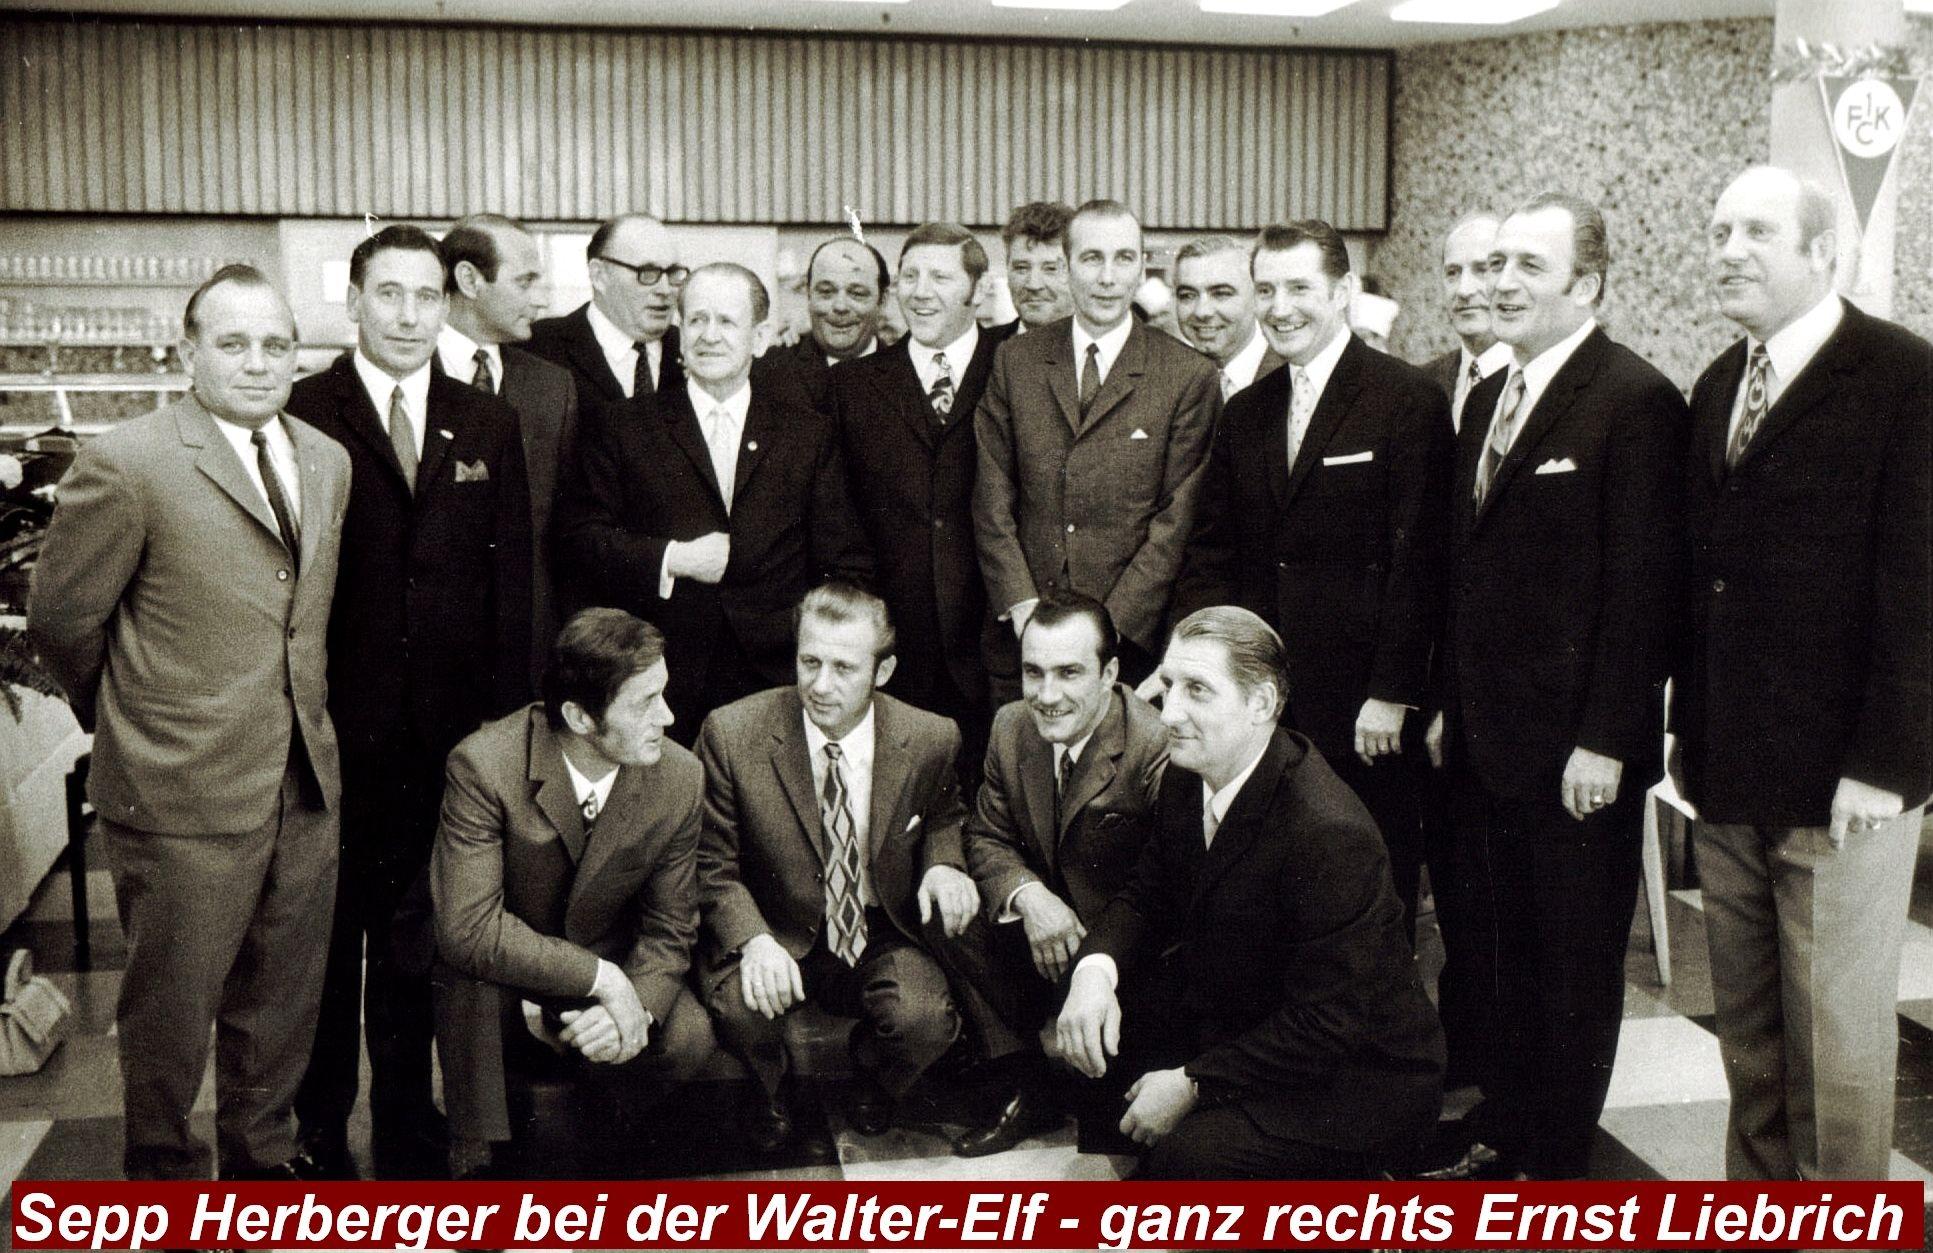 Herberger bei der Walter-Elf